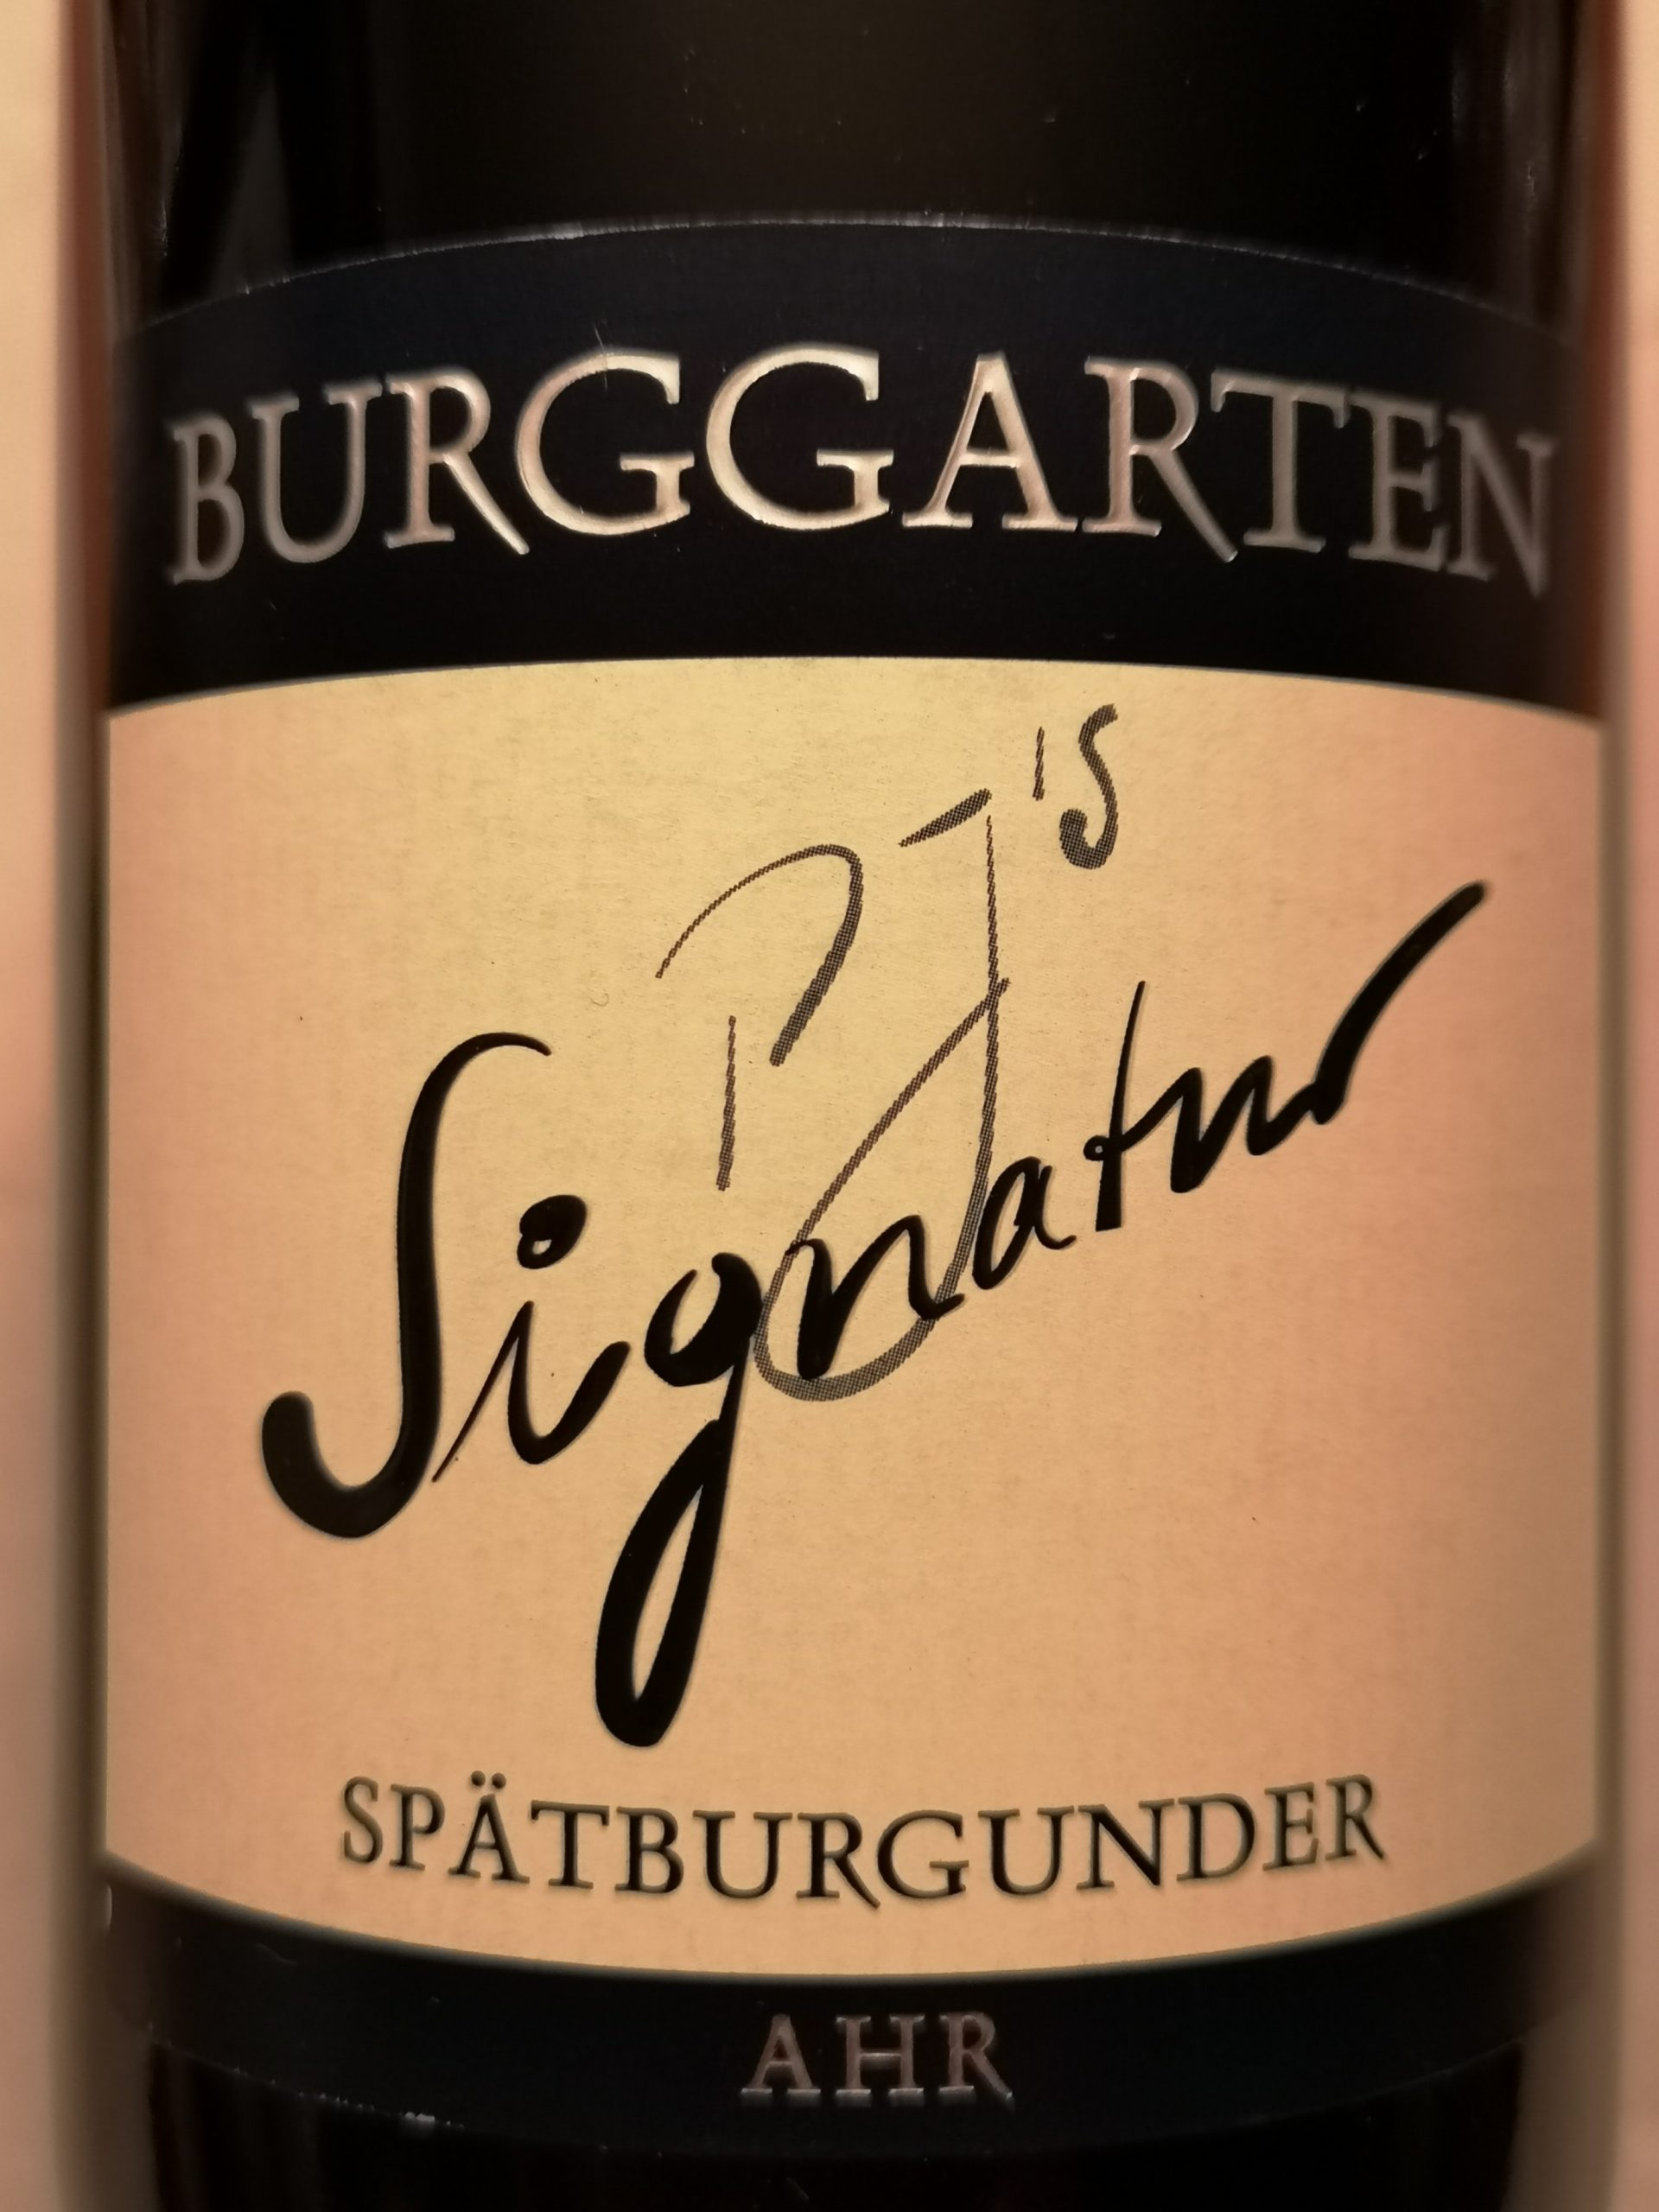 2017 Spätburgunder Signatur trocken | Burggarten